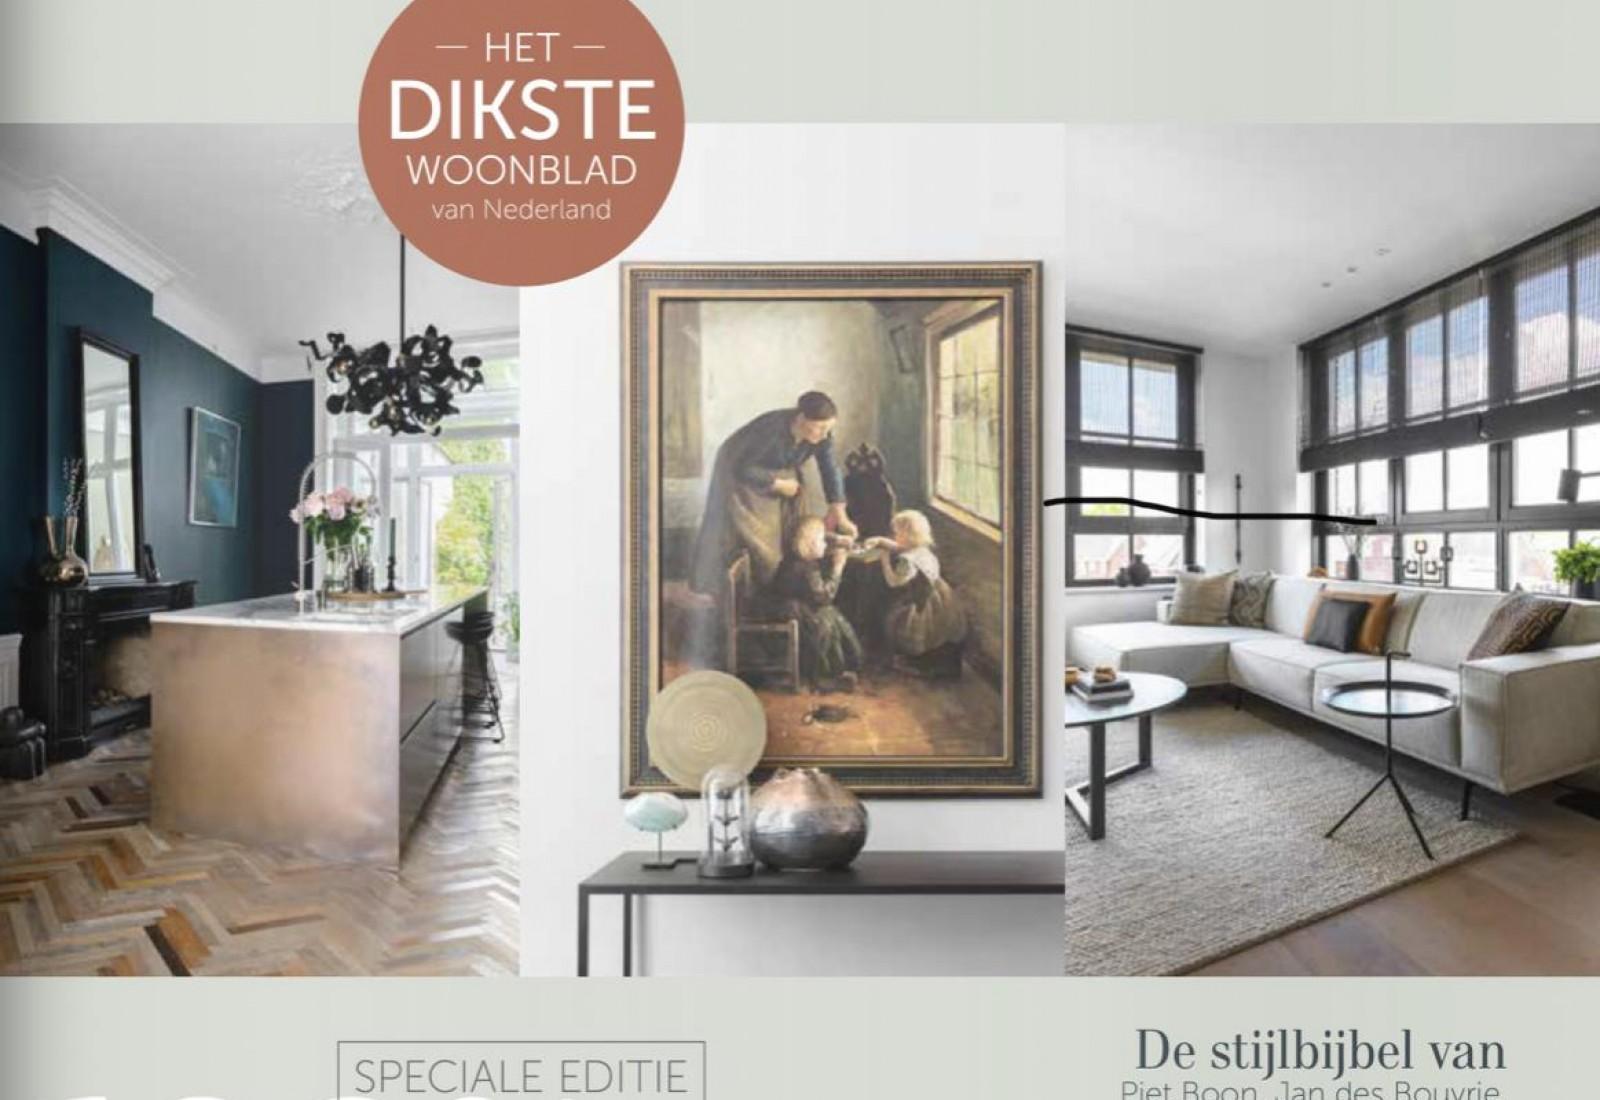 Thumbnail for Villa Bilthoven in Stijlvol Wonen